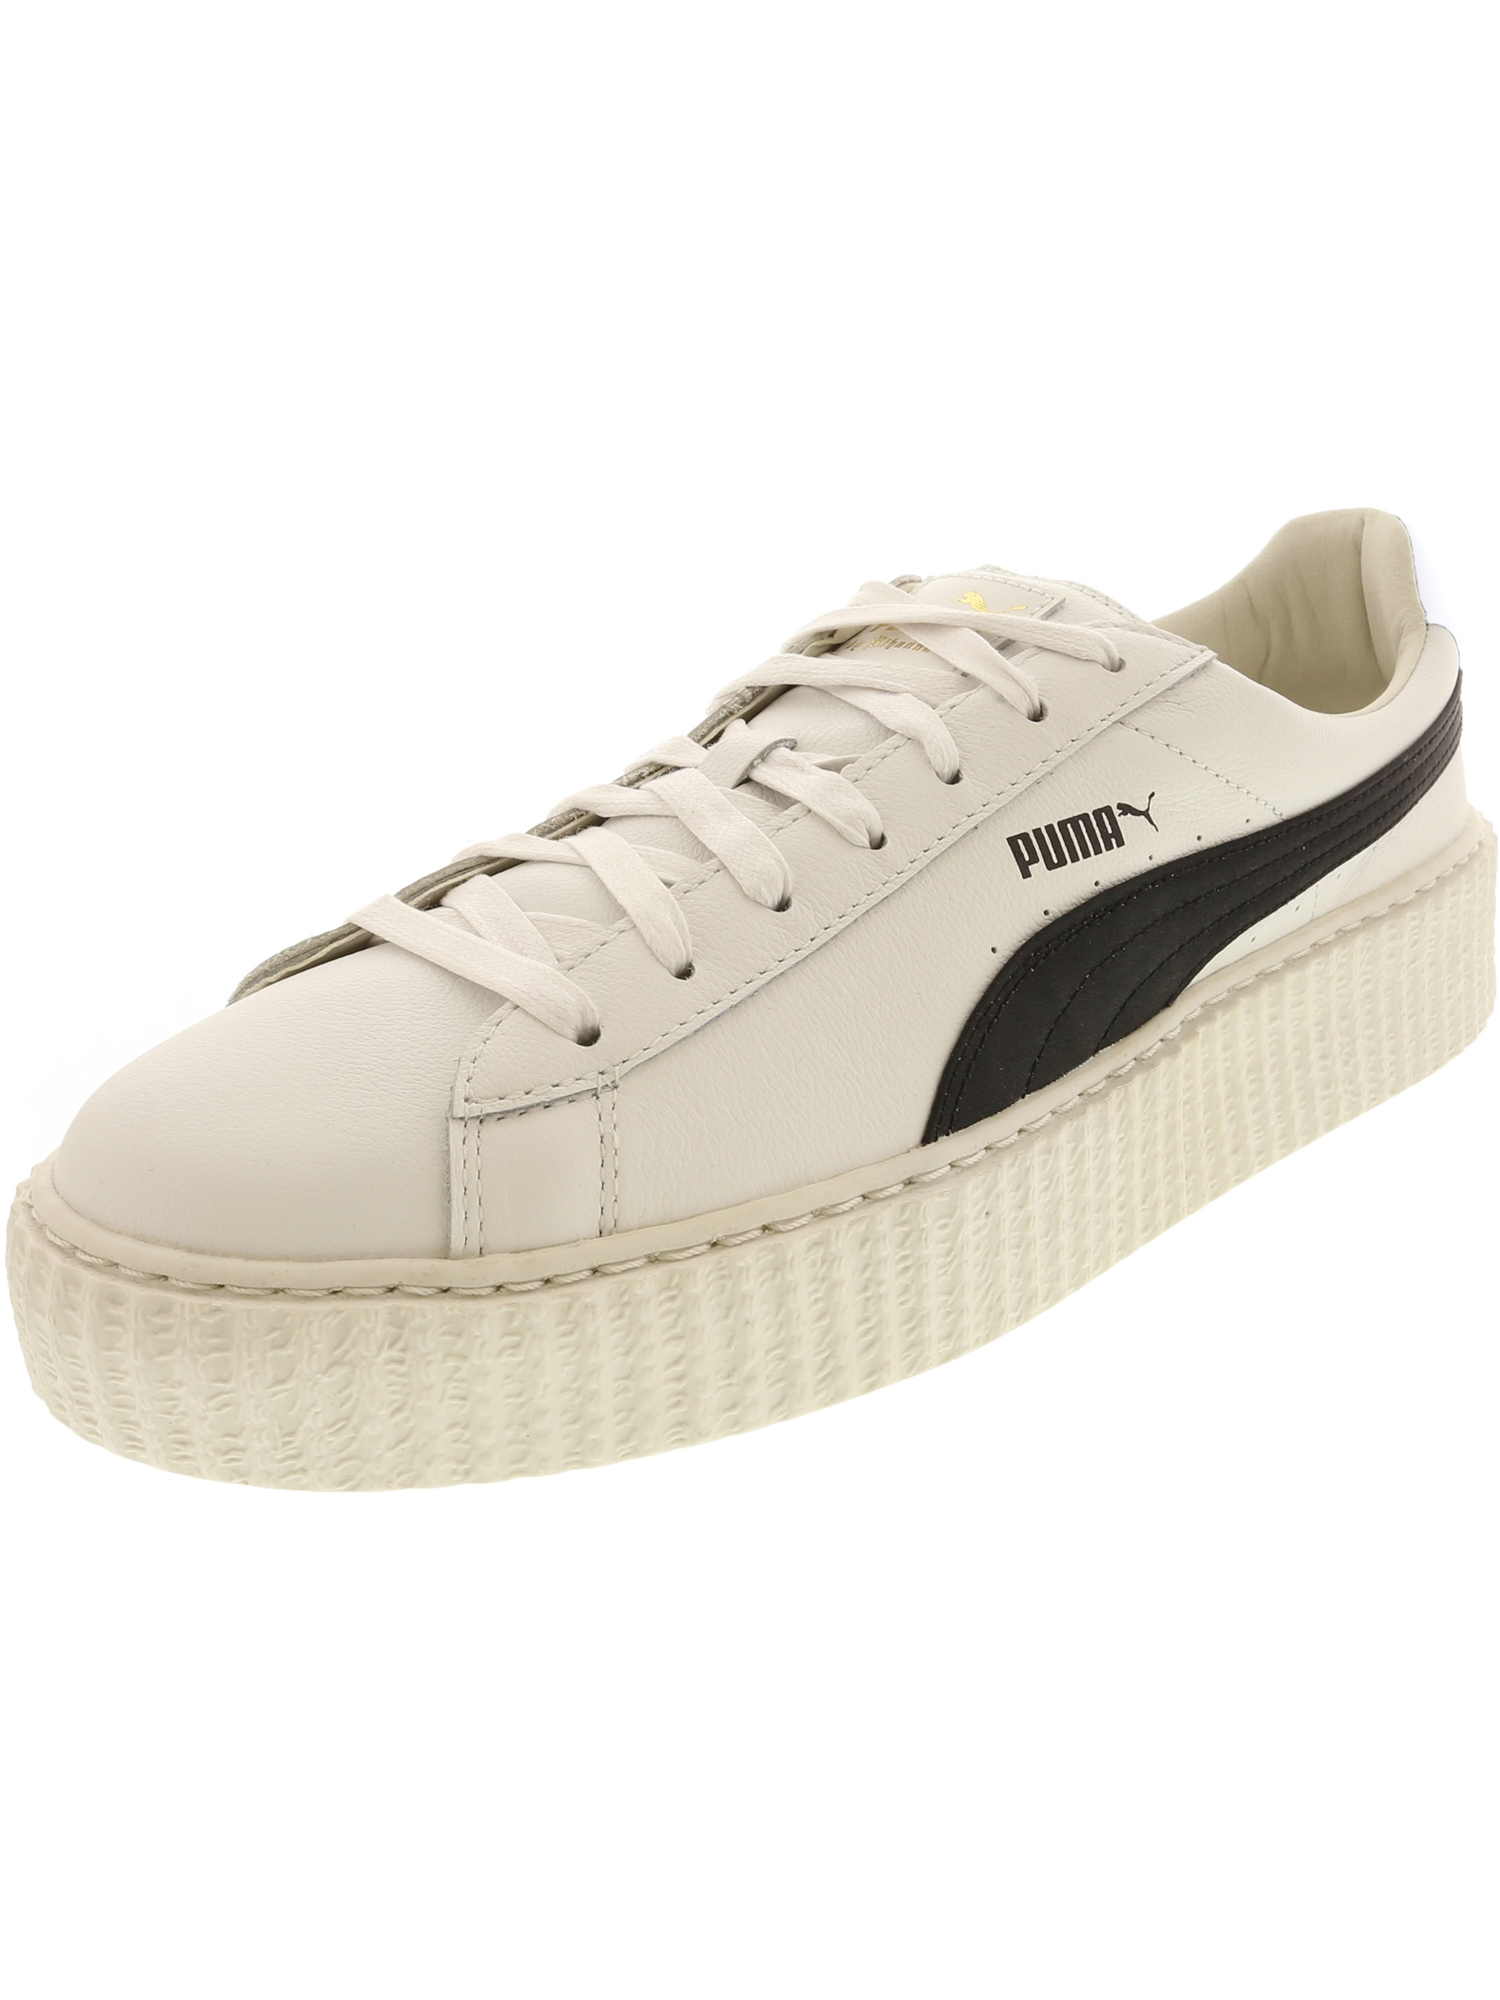 Puma Men's Creeper White / Black Ankle-High Leather Fashion Sneaker - 11M